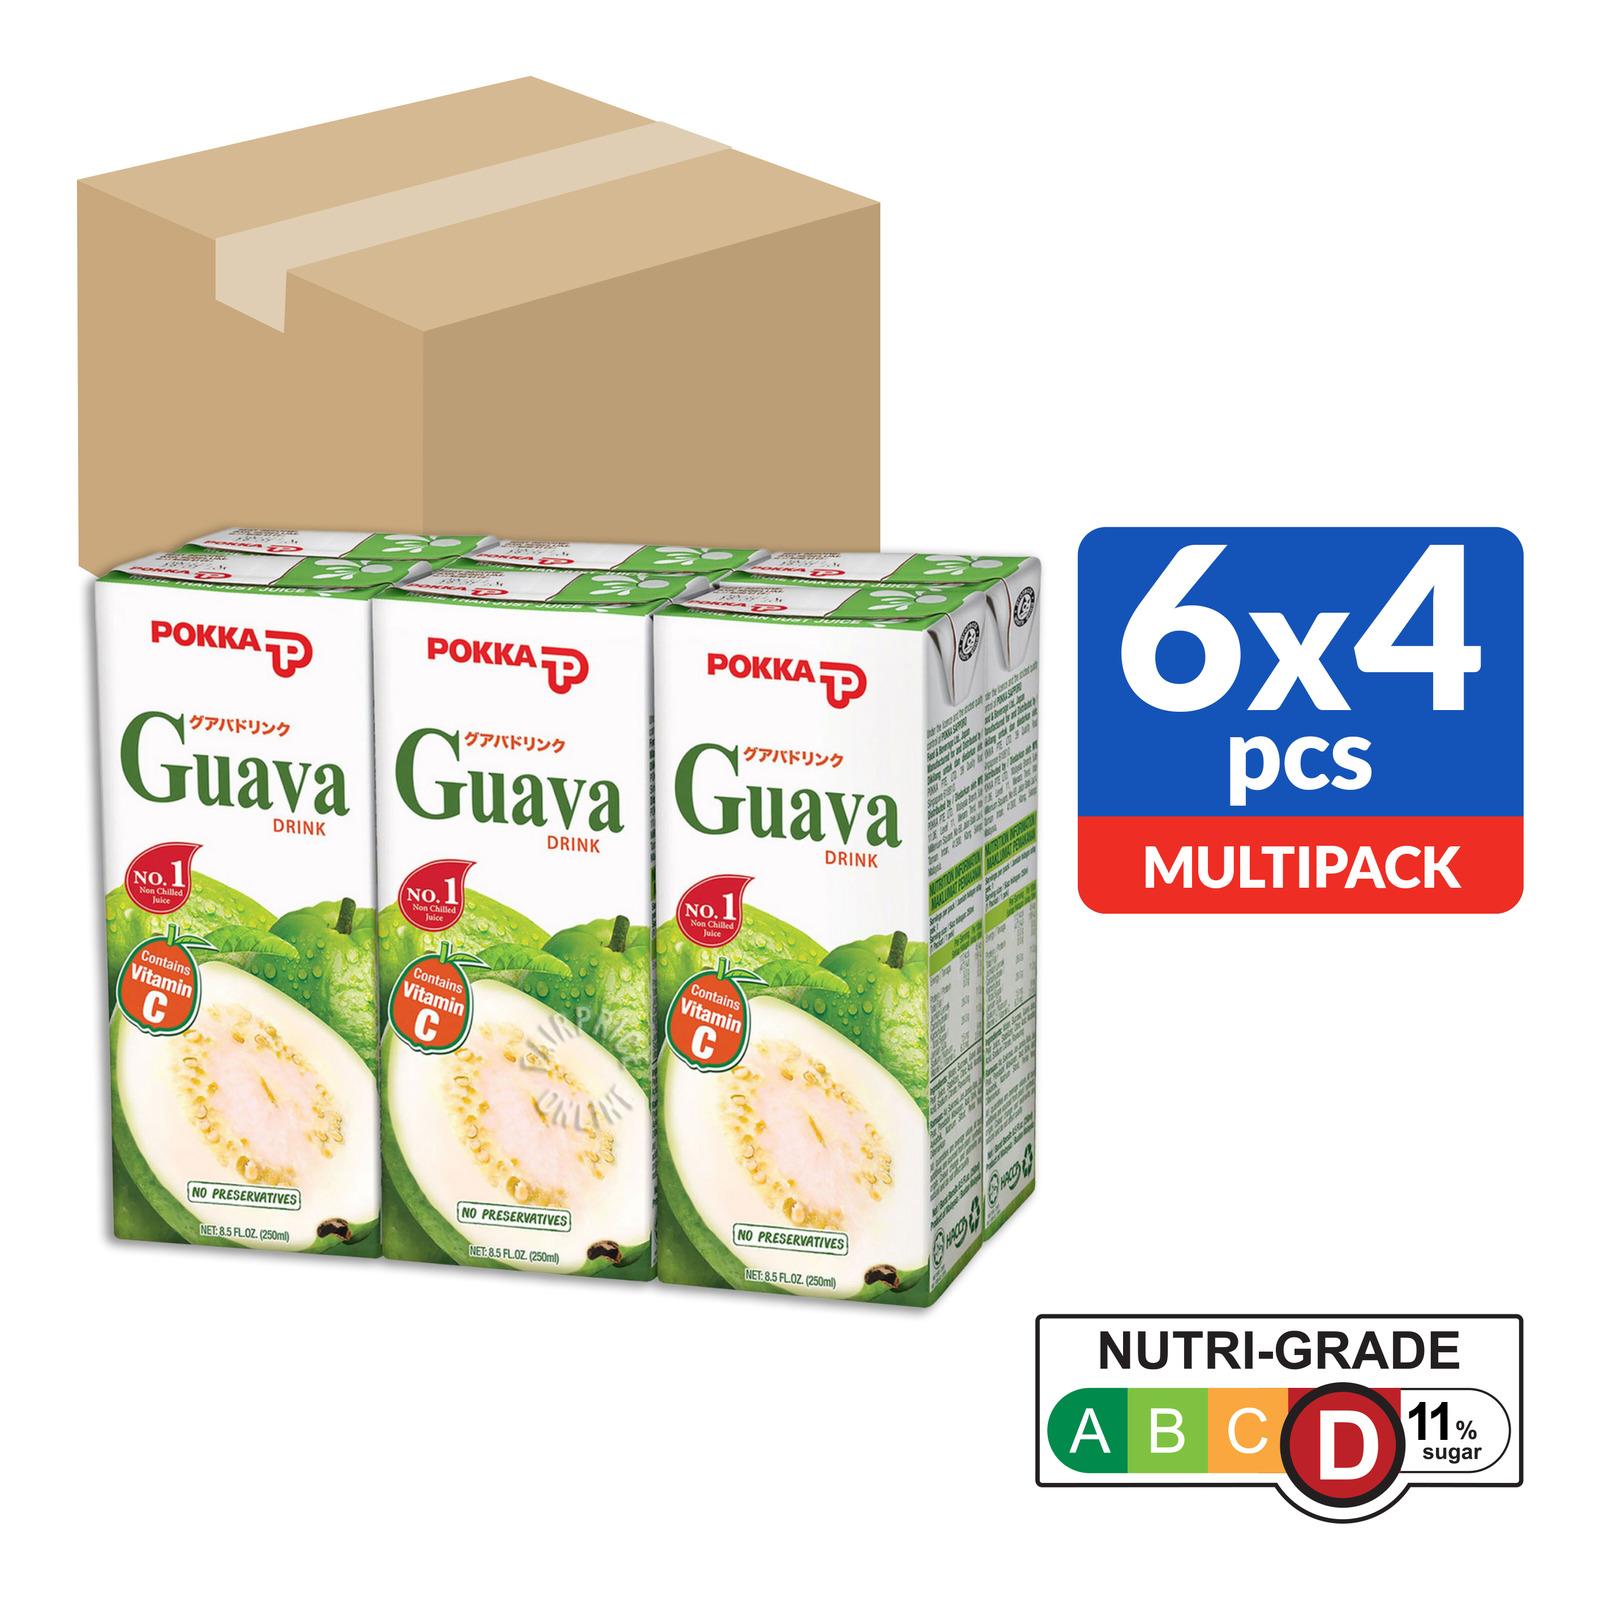 Pokka Packet Drink - Guava Juice